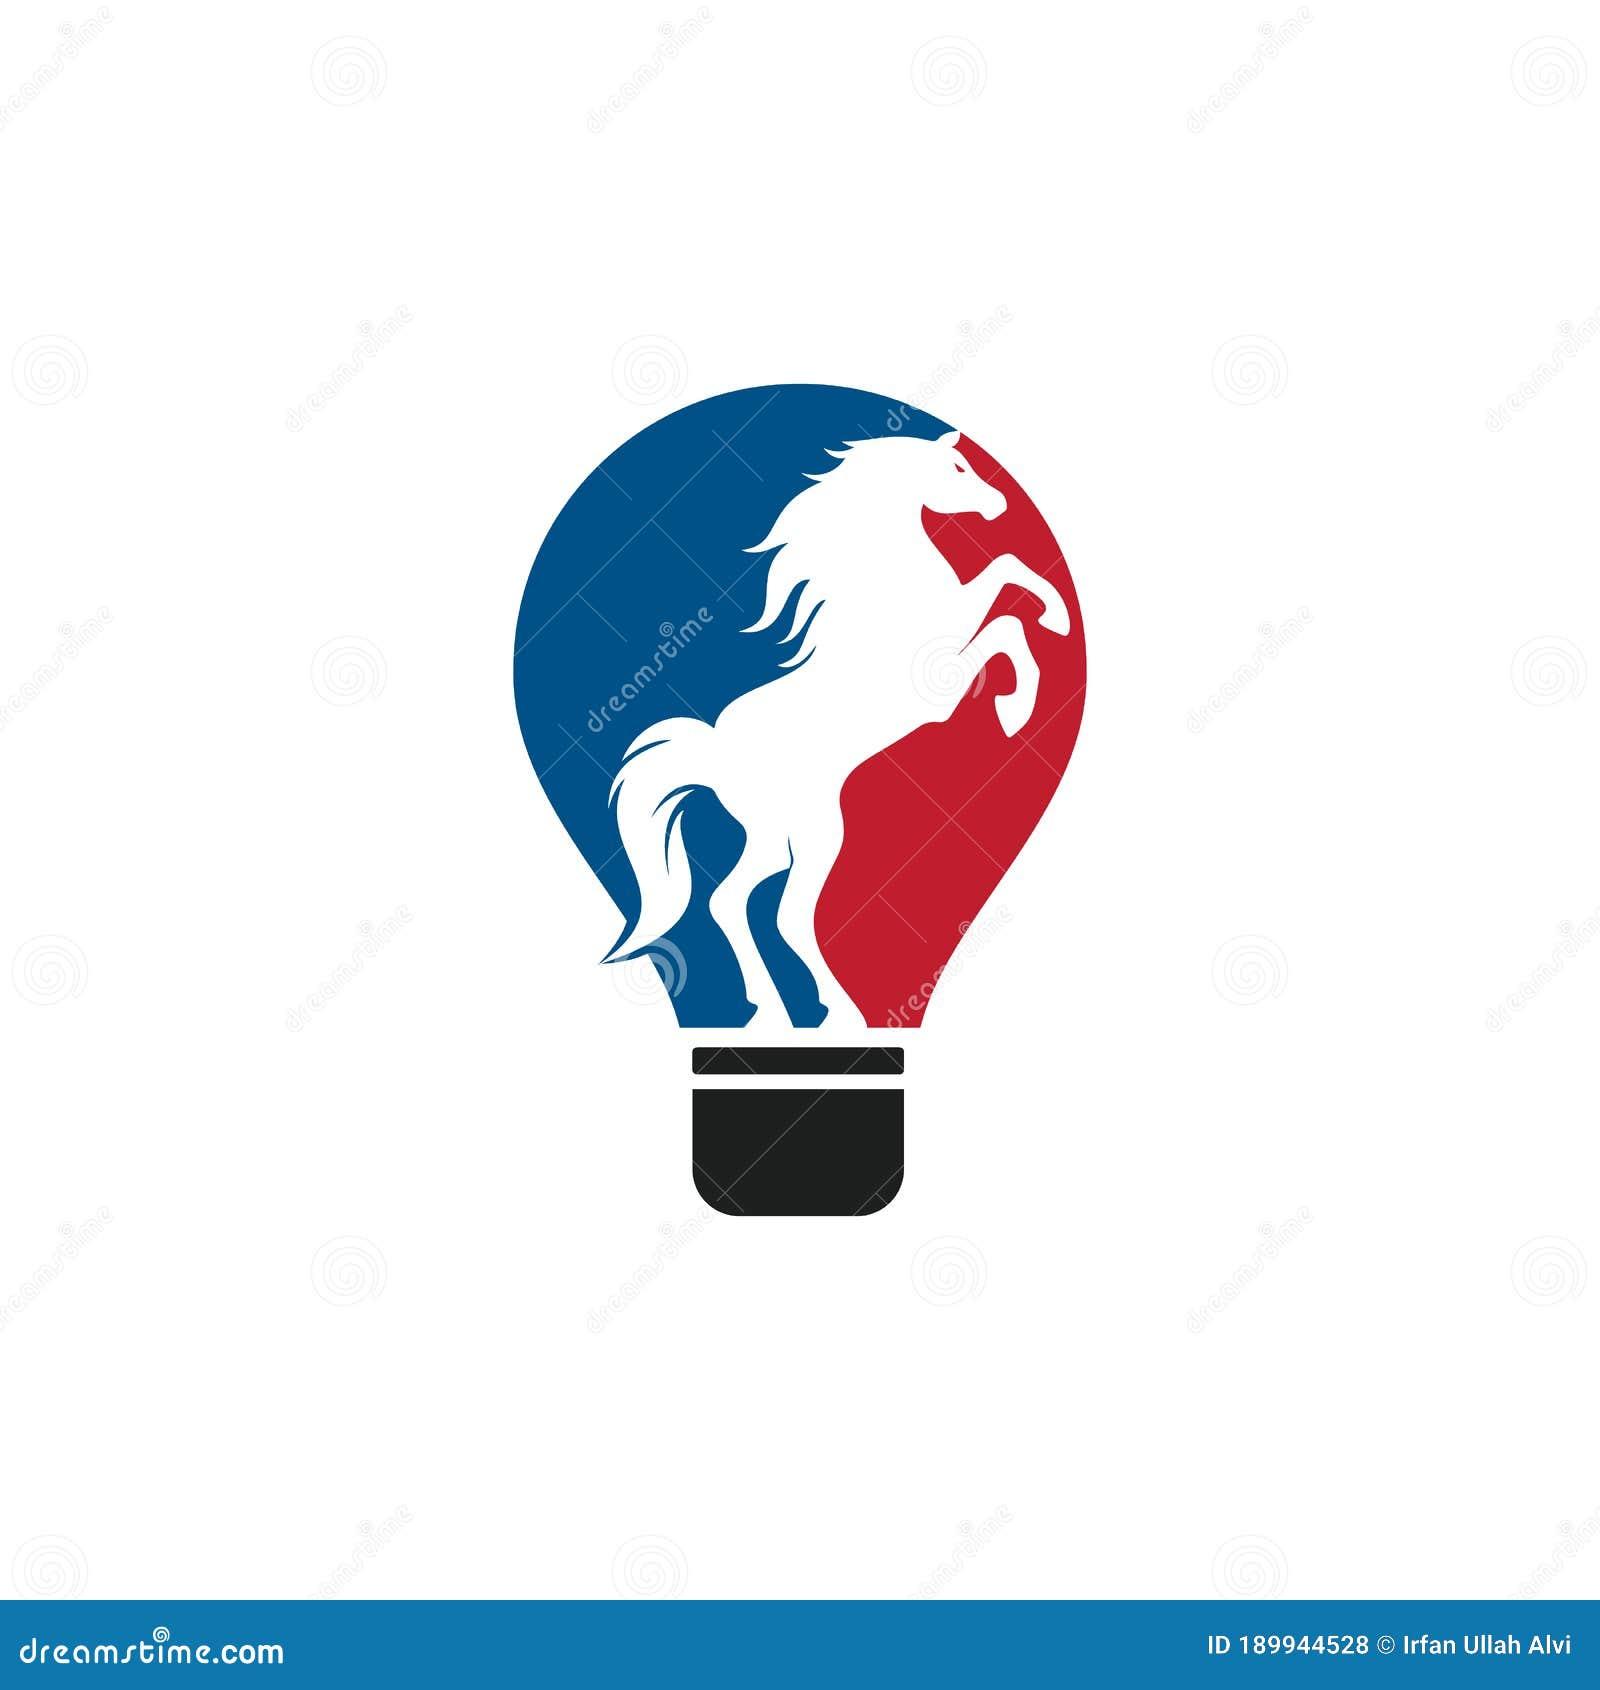 Light Bulb And Horse Logo Design Stock Vector Illustration Of Background Innovation 189944528